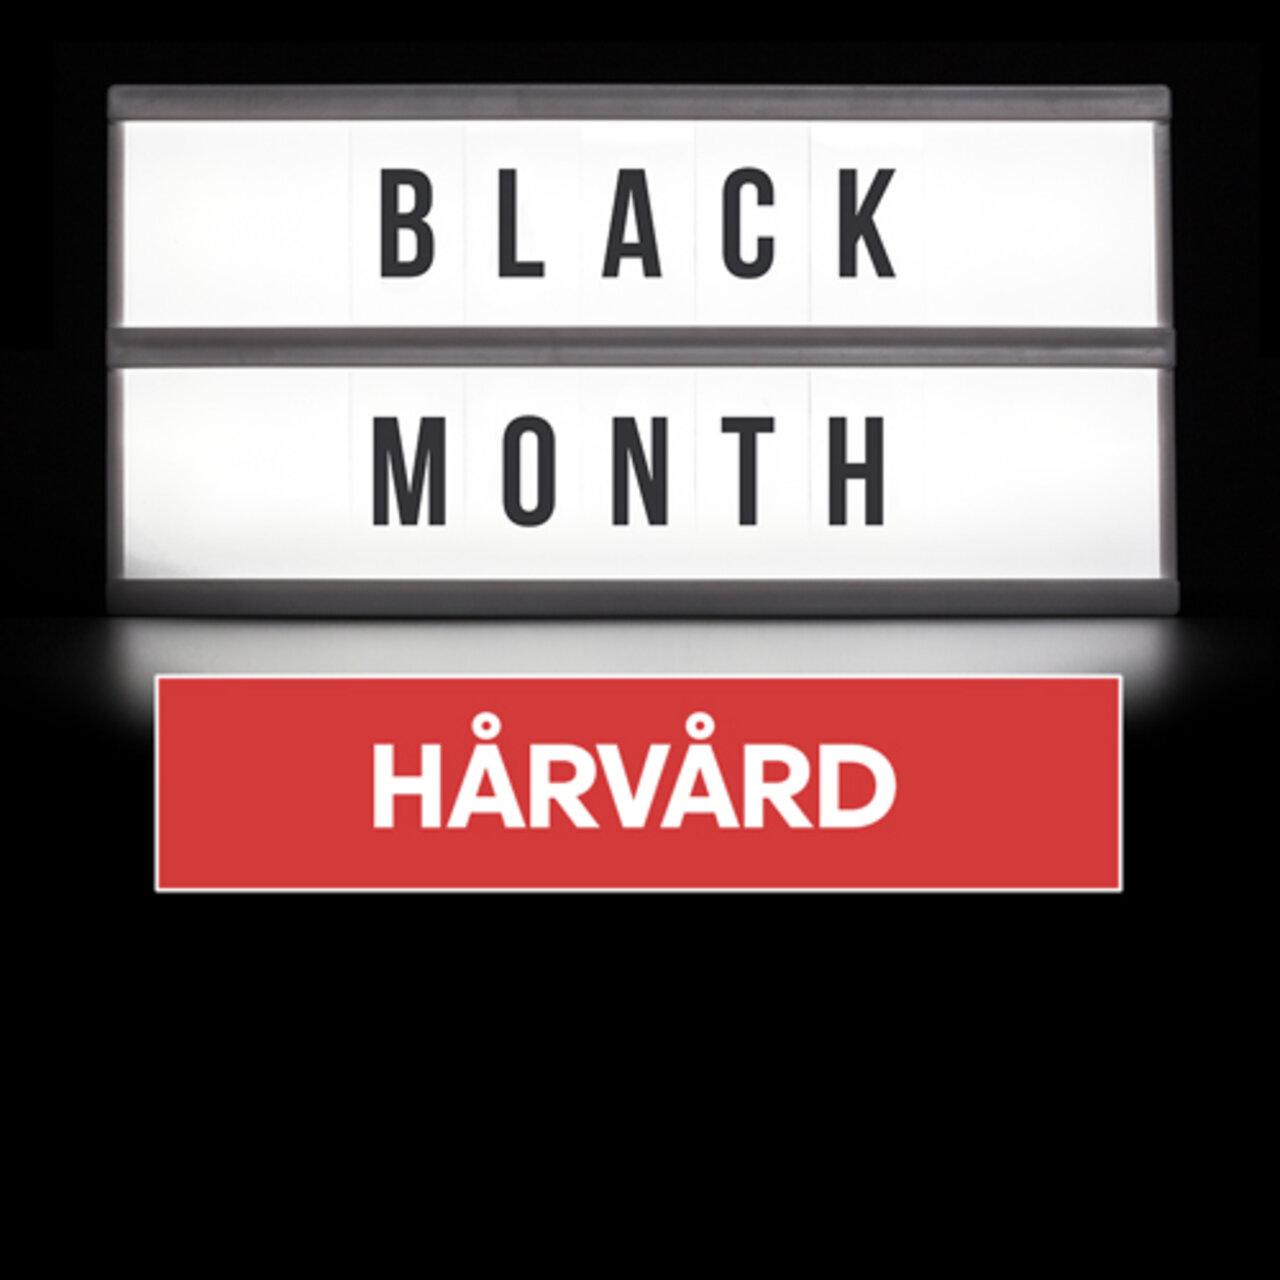 /harvard?f_Other=Black%20Month